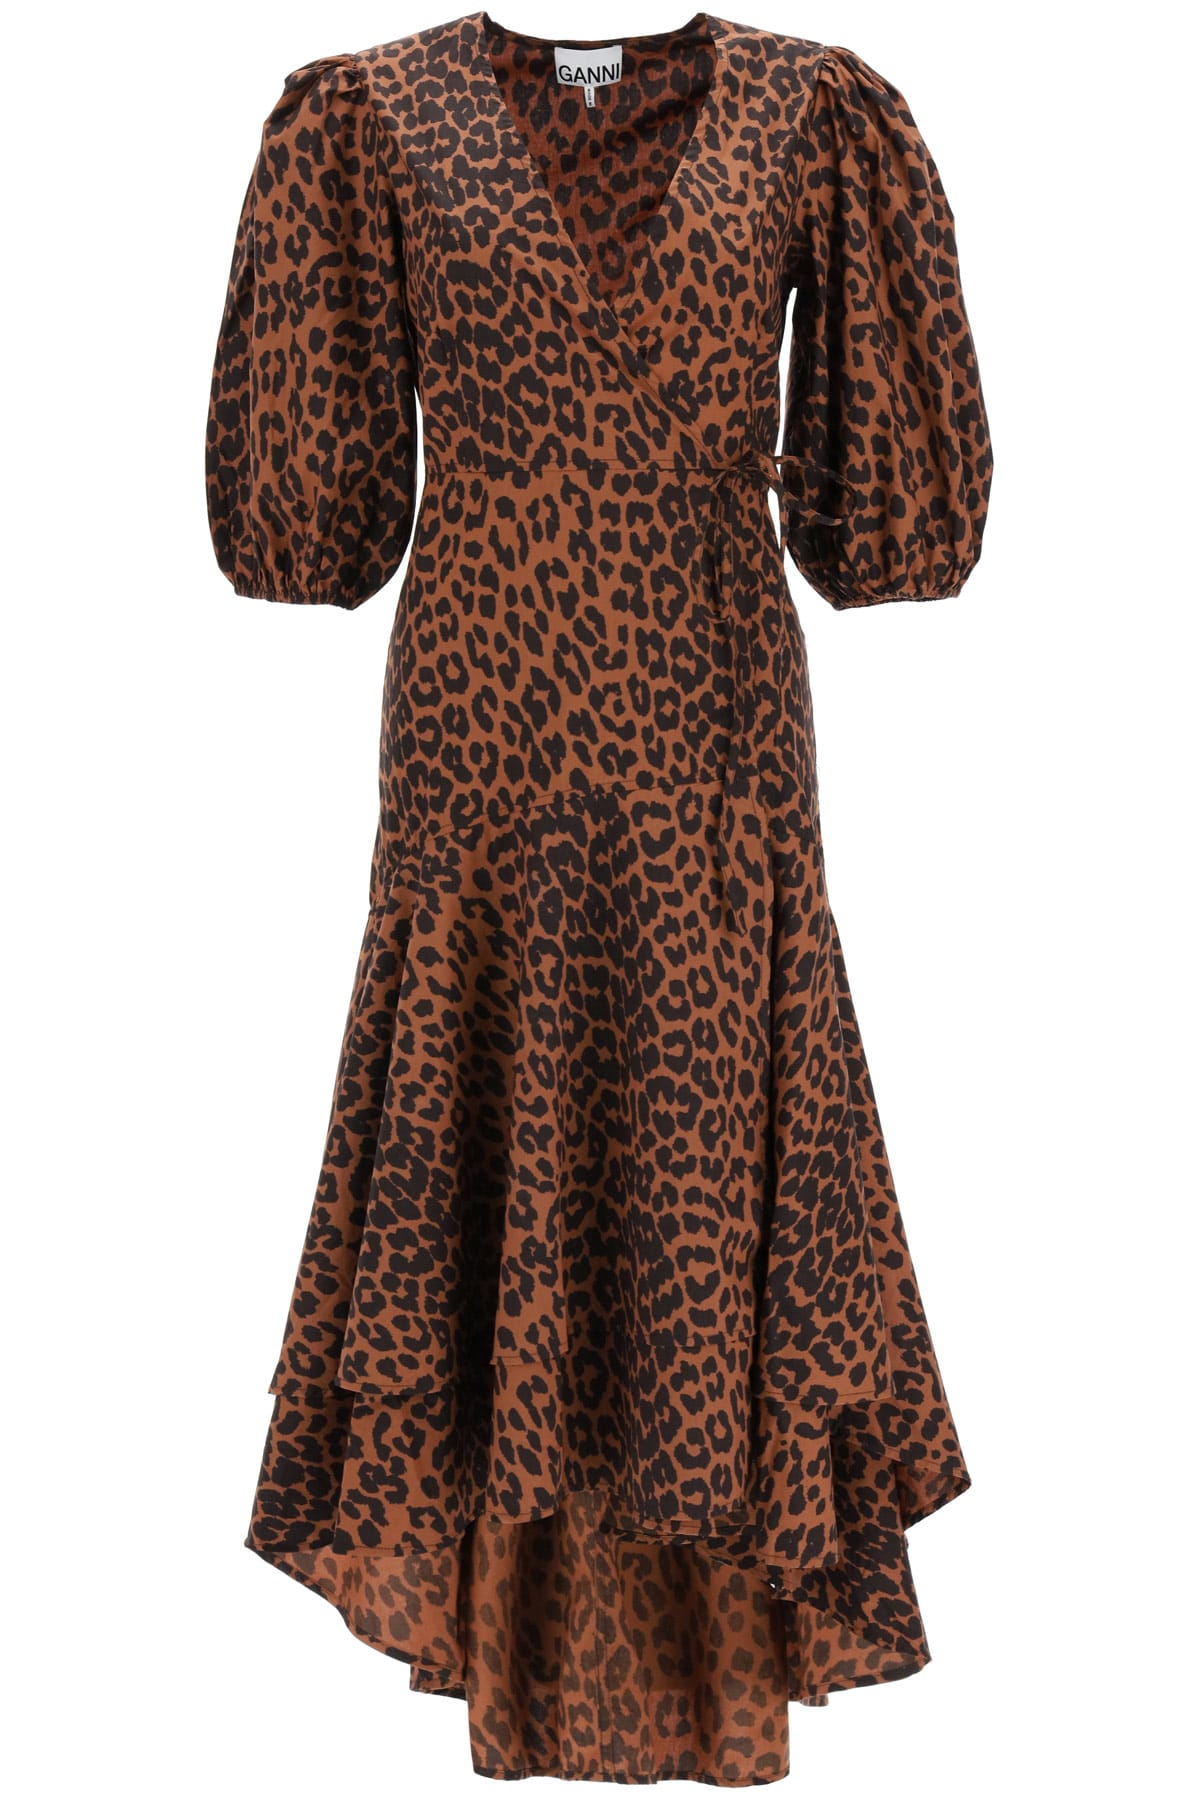 Ganni Asymmetrical Leopard Print Dress